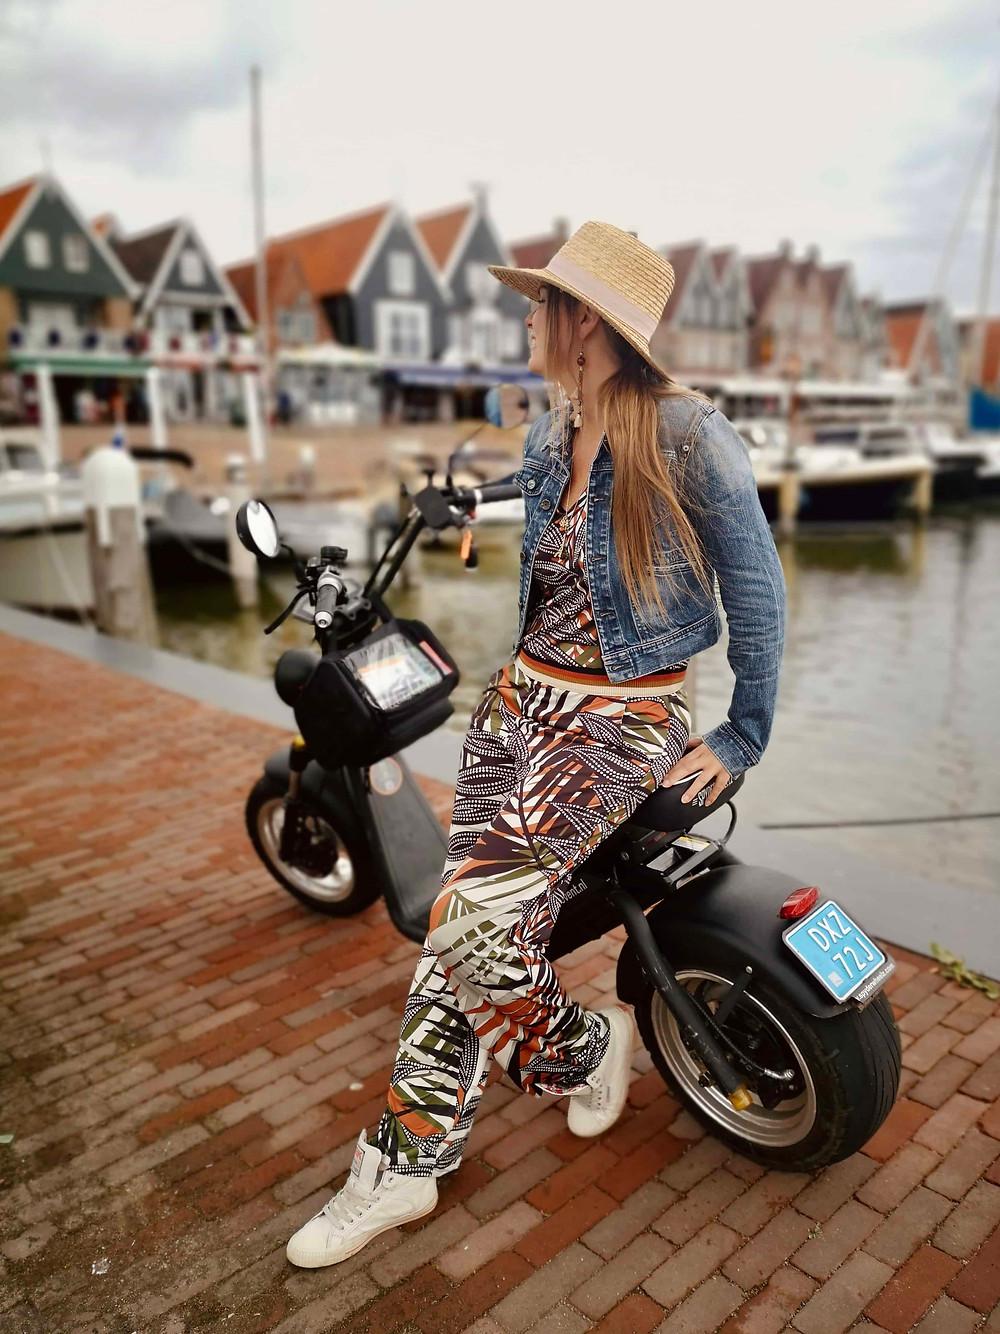 Volendam Rent & Event - The Netherlands